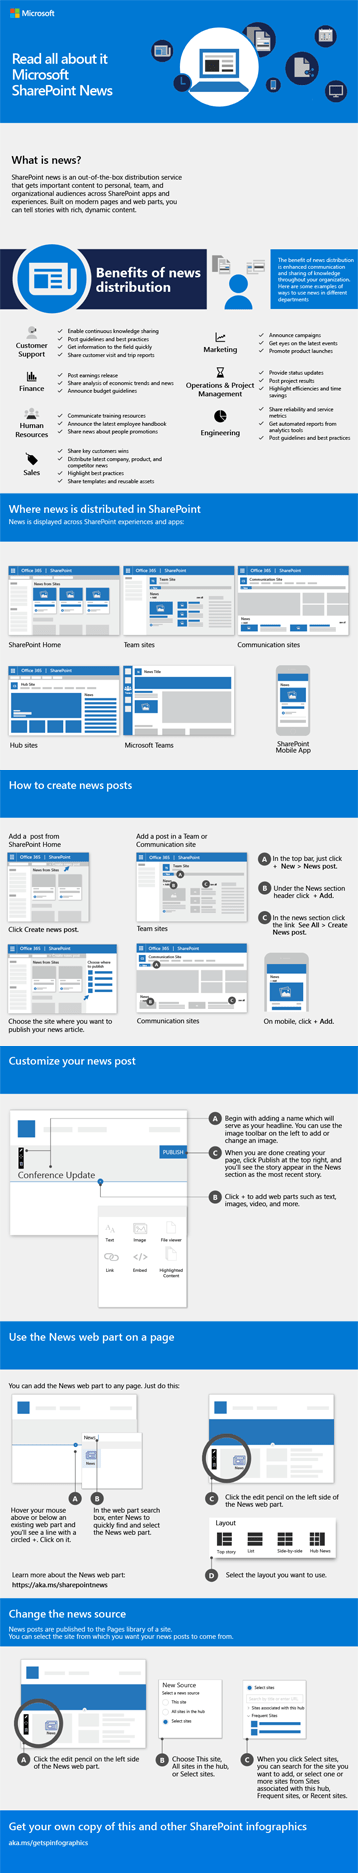 SharePoint News Infographic